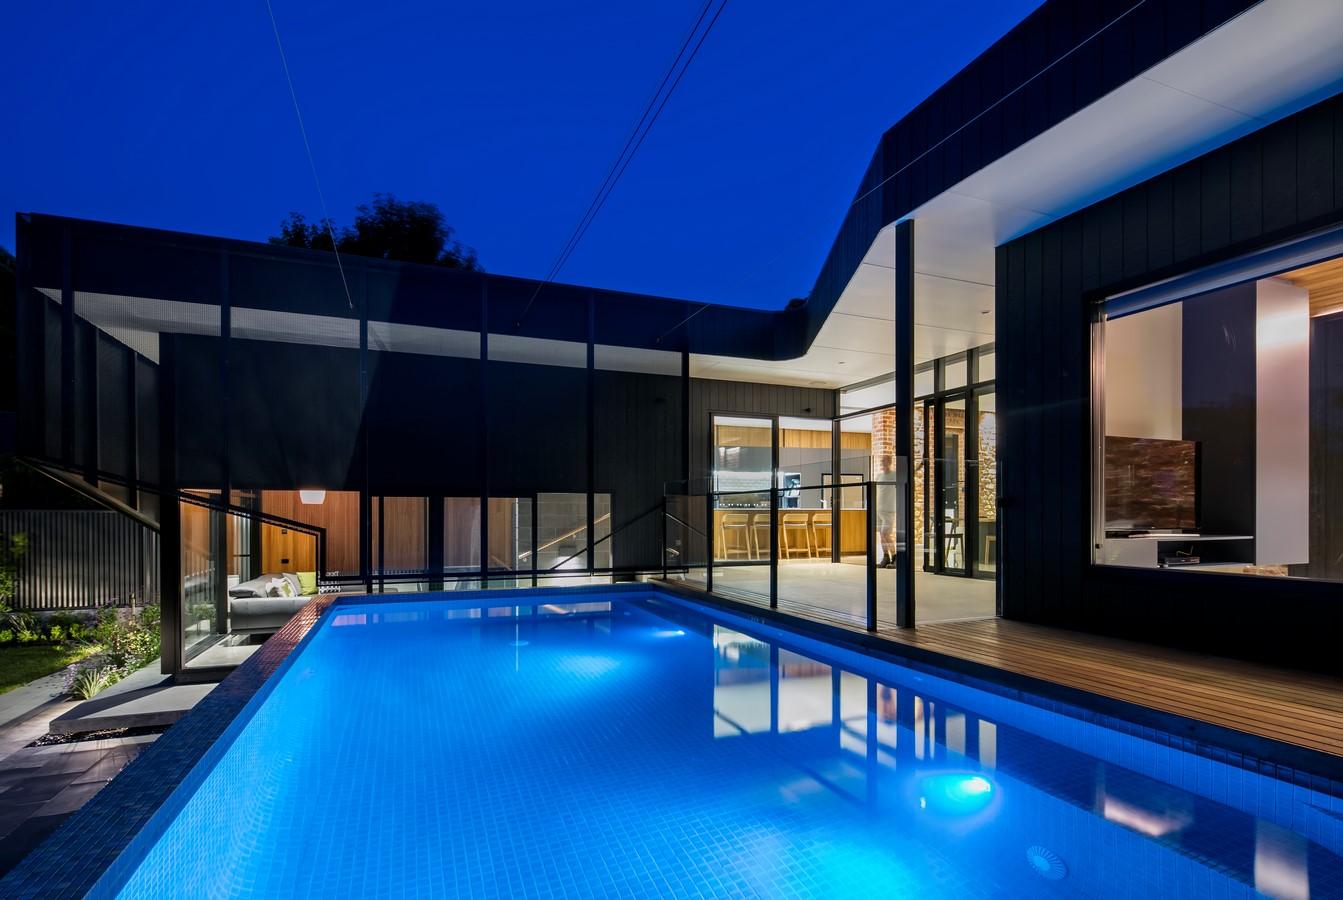 5111 Veil + Mortar by Khab Architects: Sheet 3